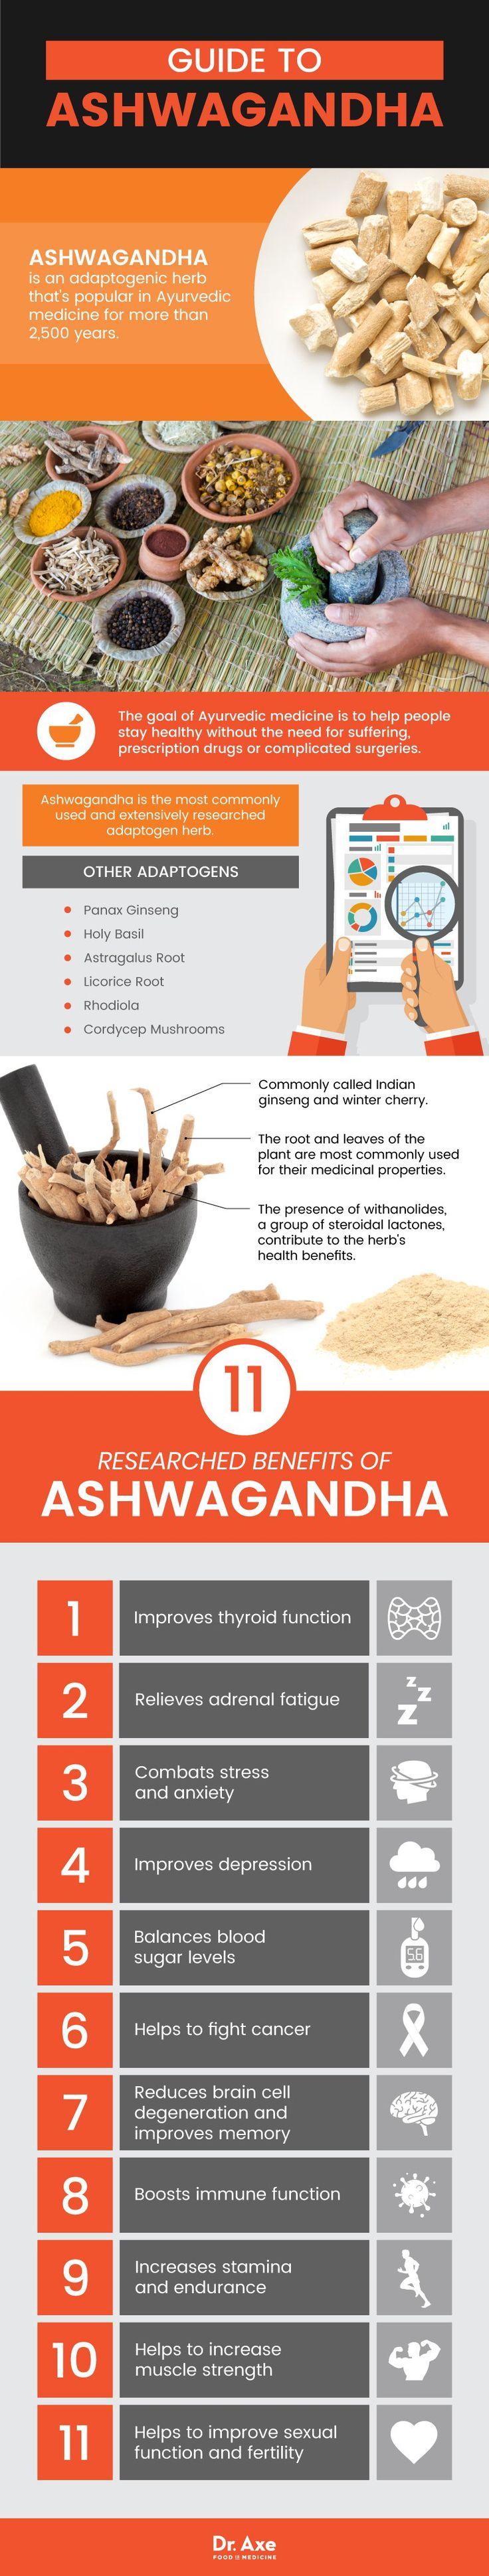 Ghid pentru beneficiile ashwagandha - Dr. Ax